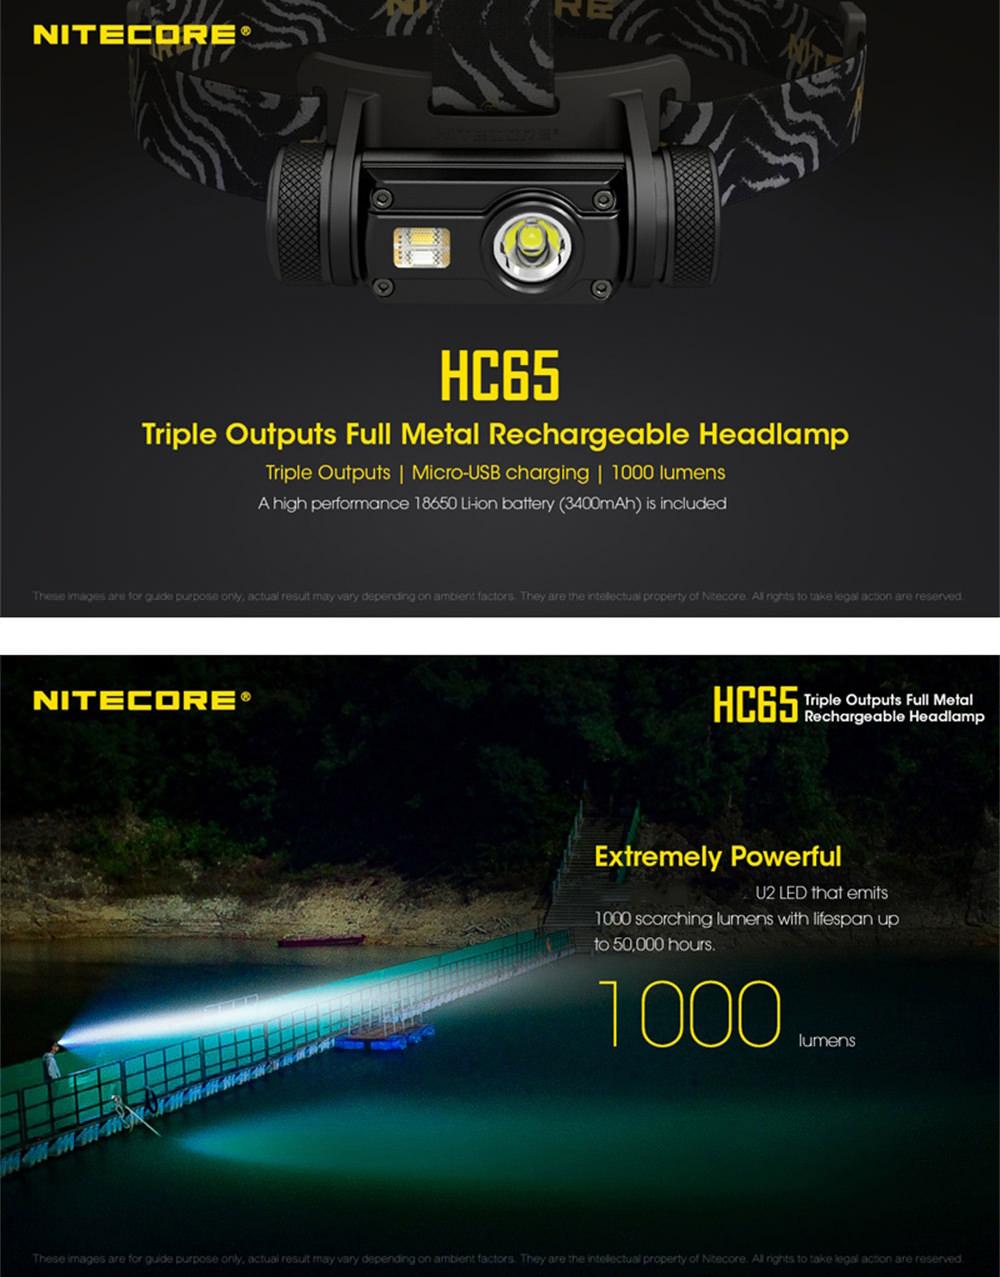 nitecore hc65 headlamp